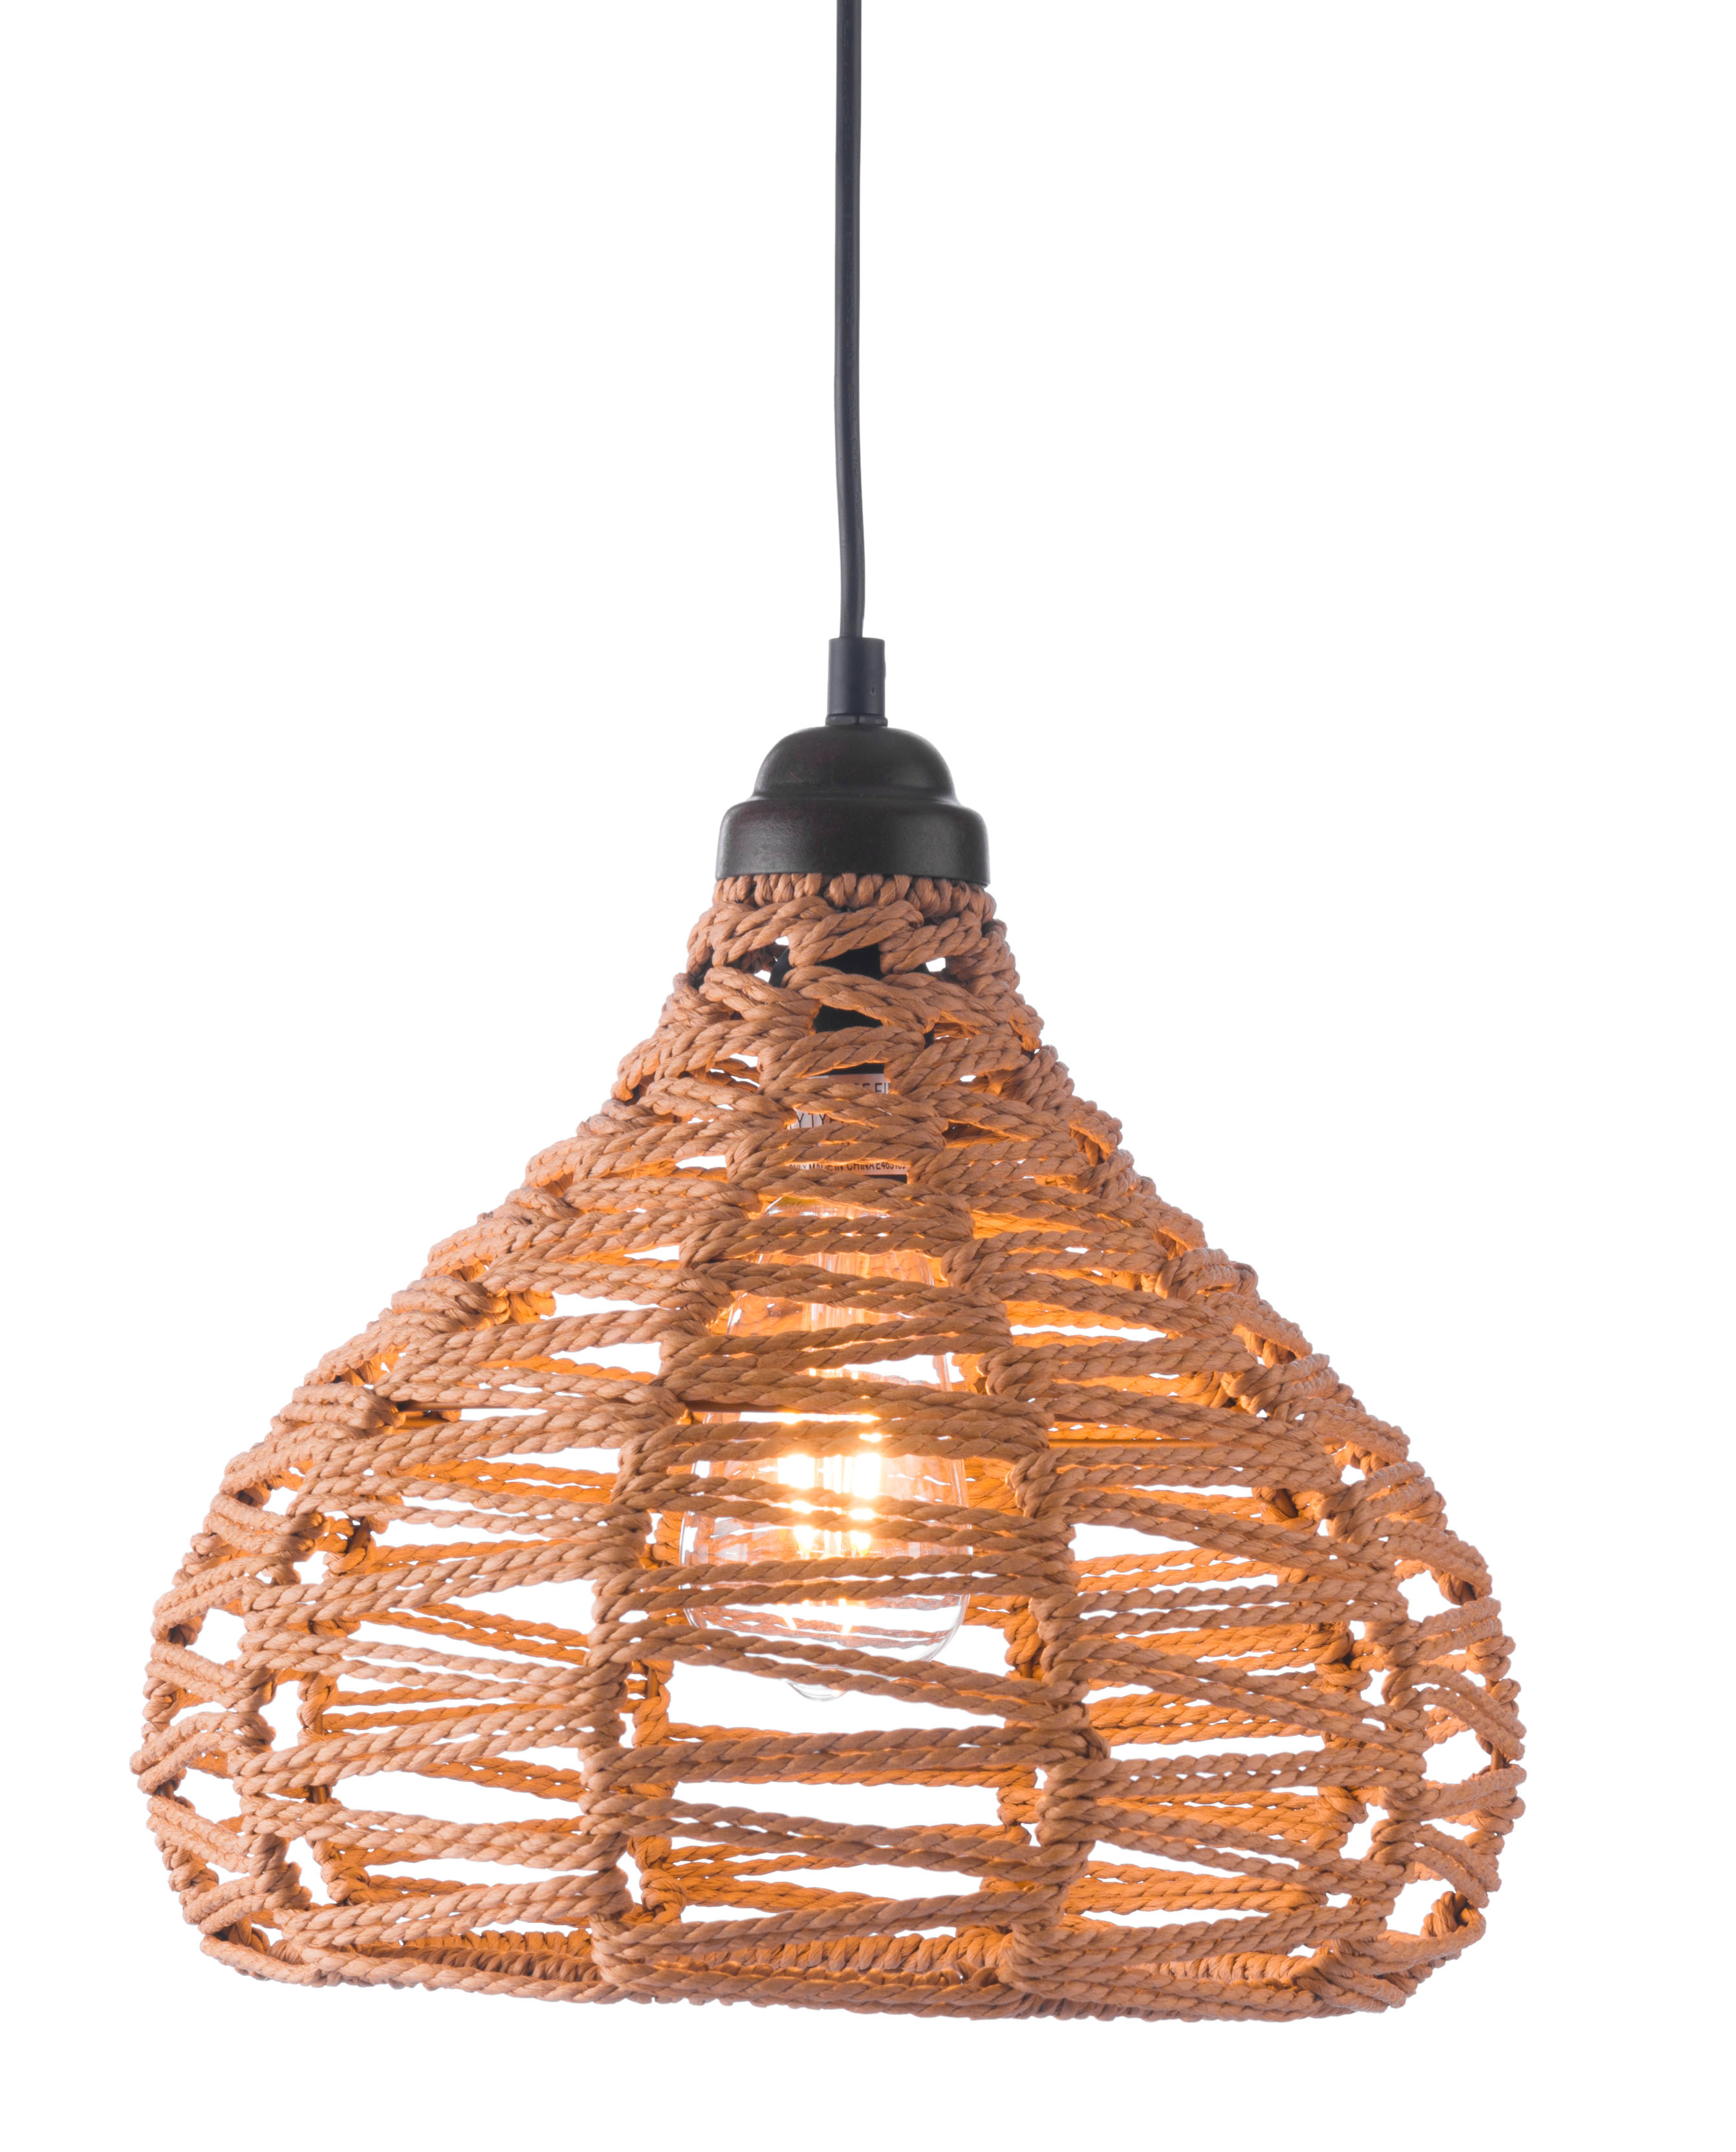 nezz-ceiling-lamp-natural.jpg